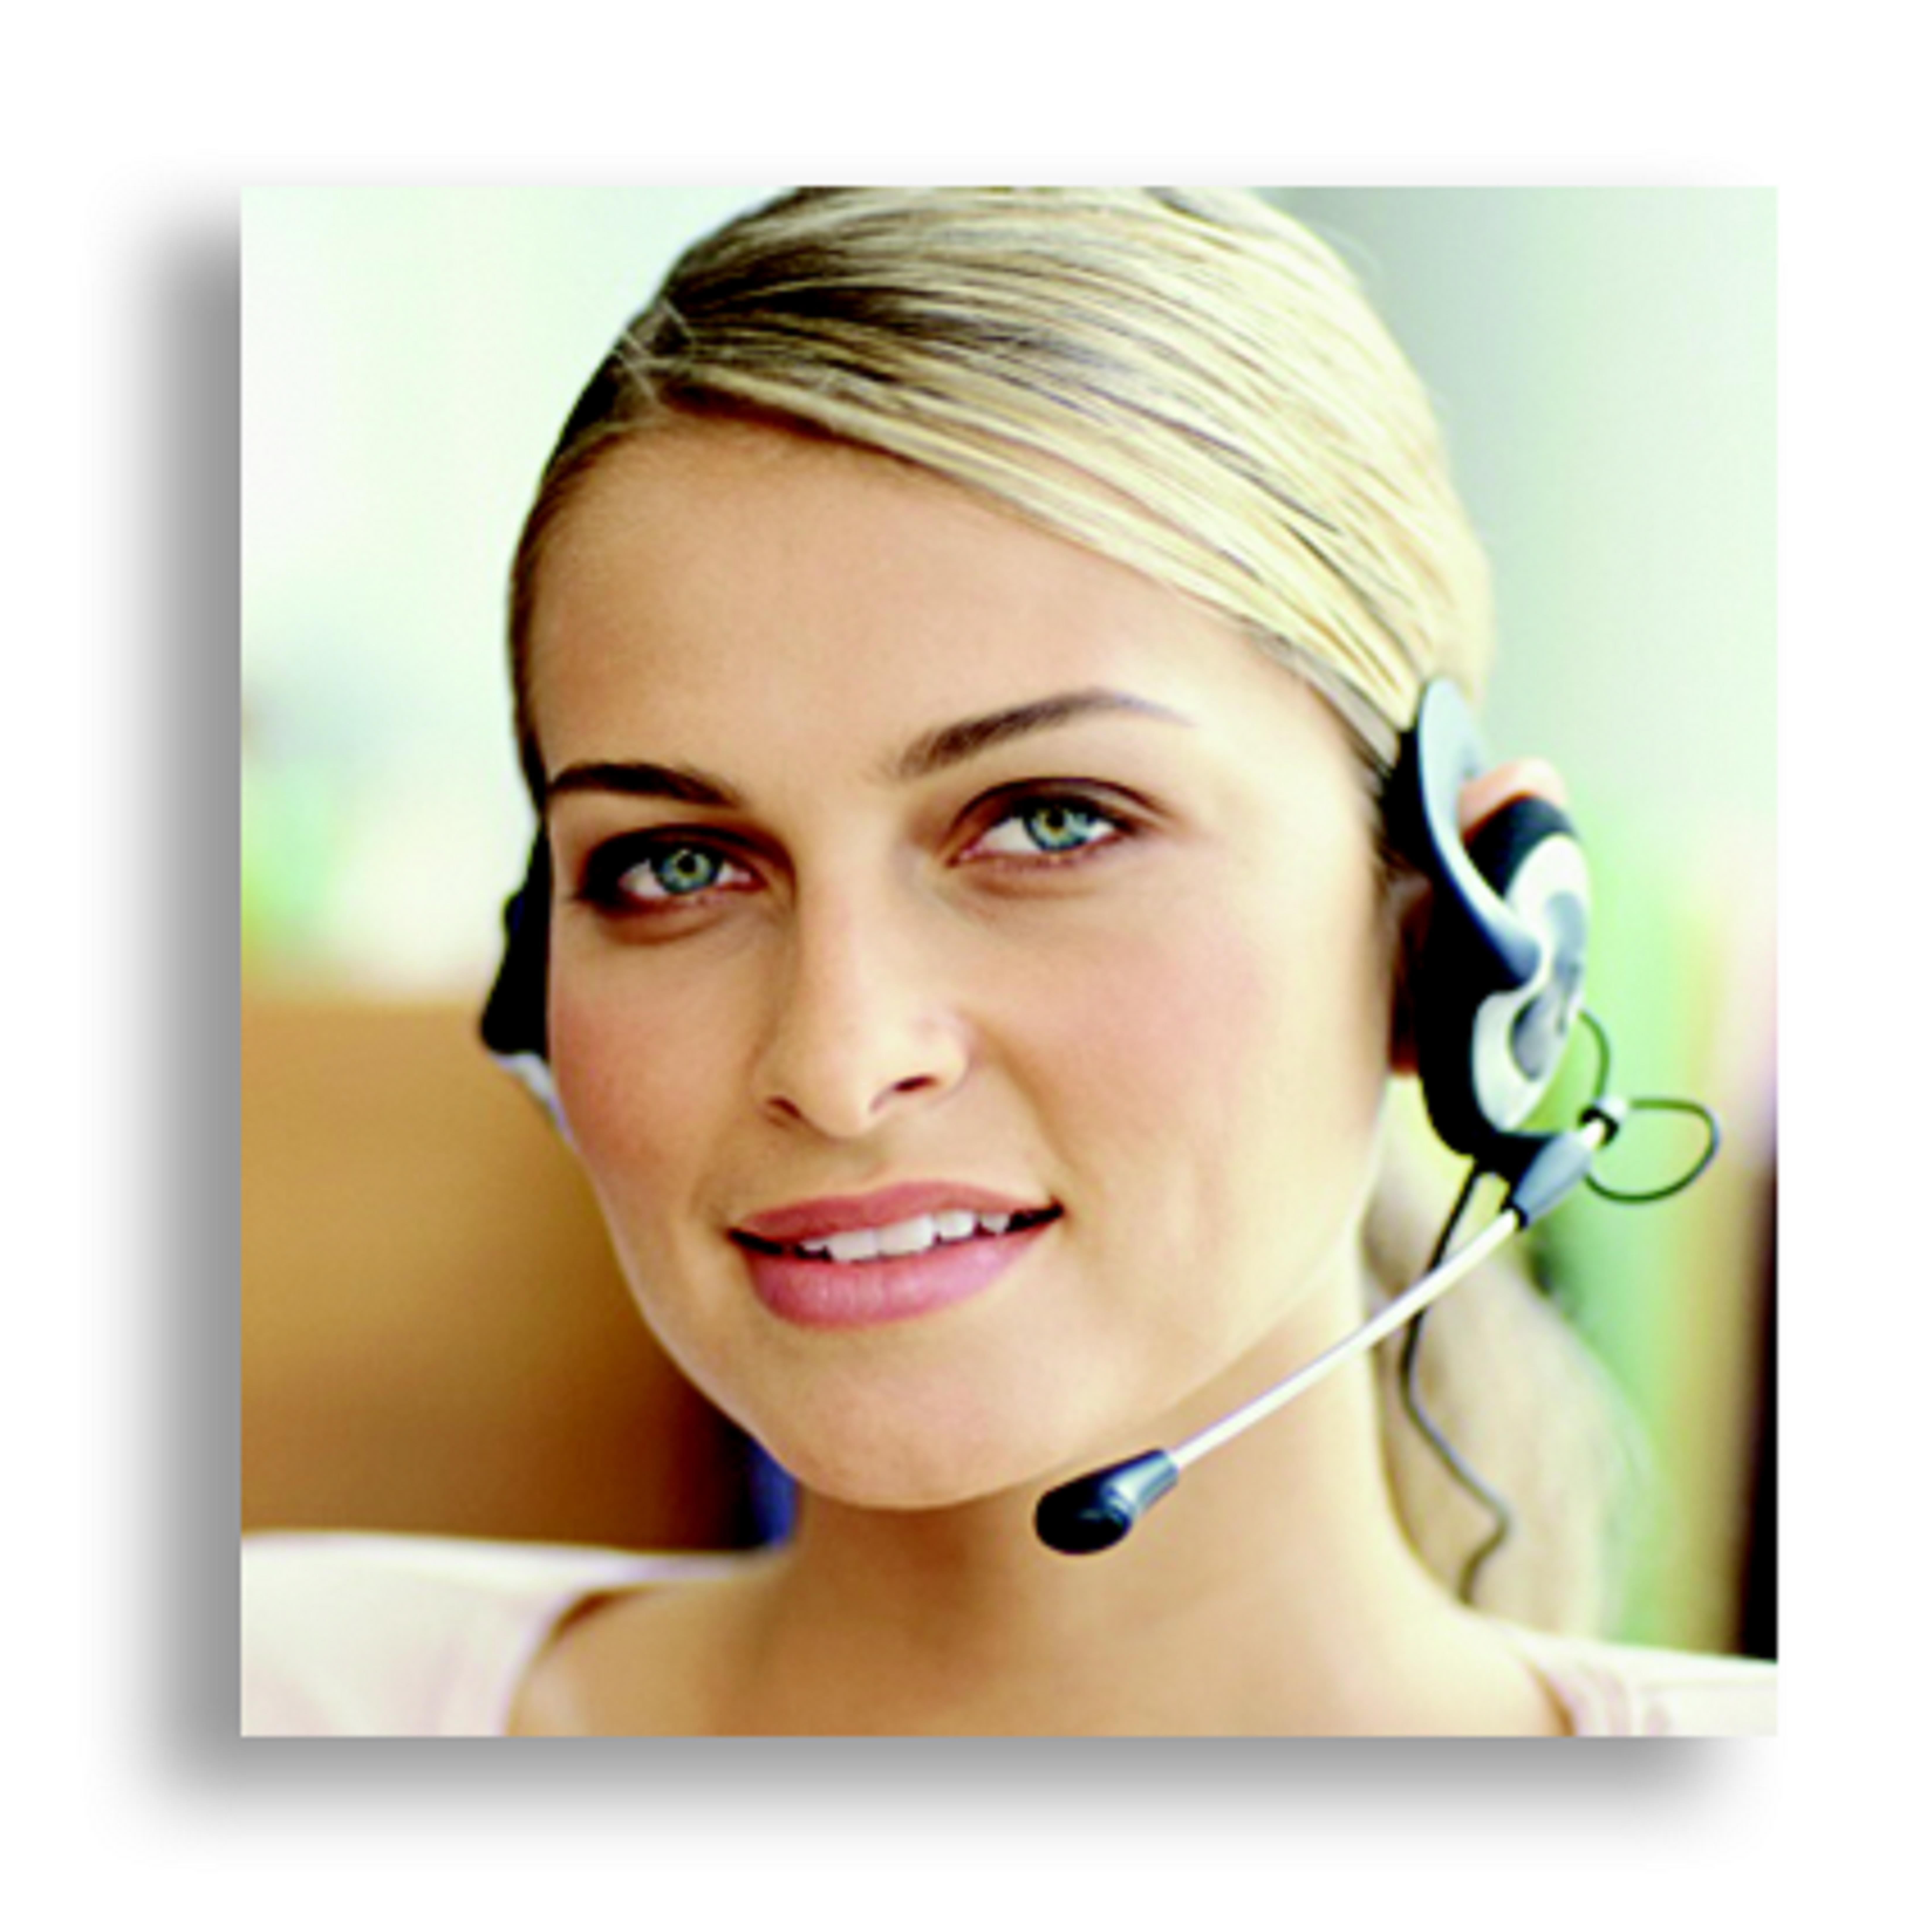 Goettsch Exceptional Customer Service